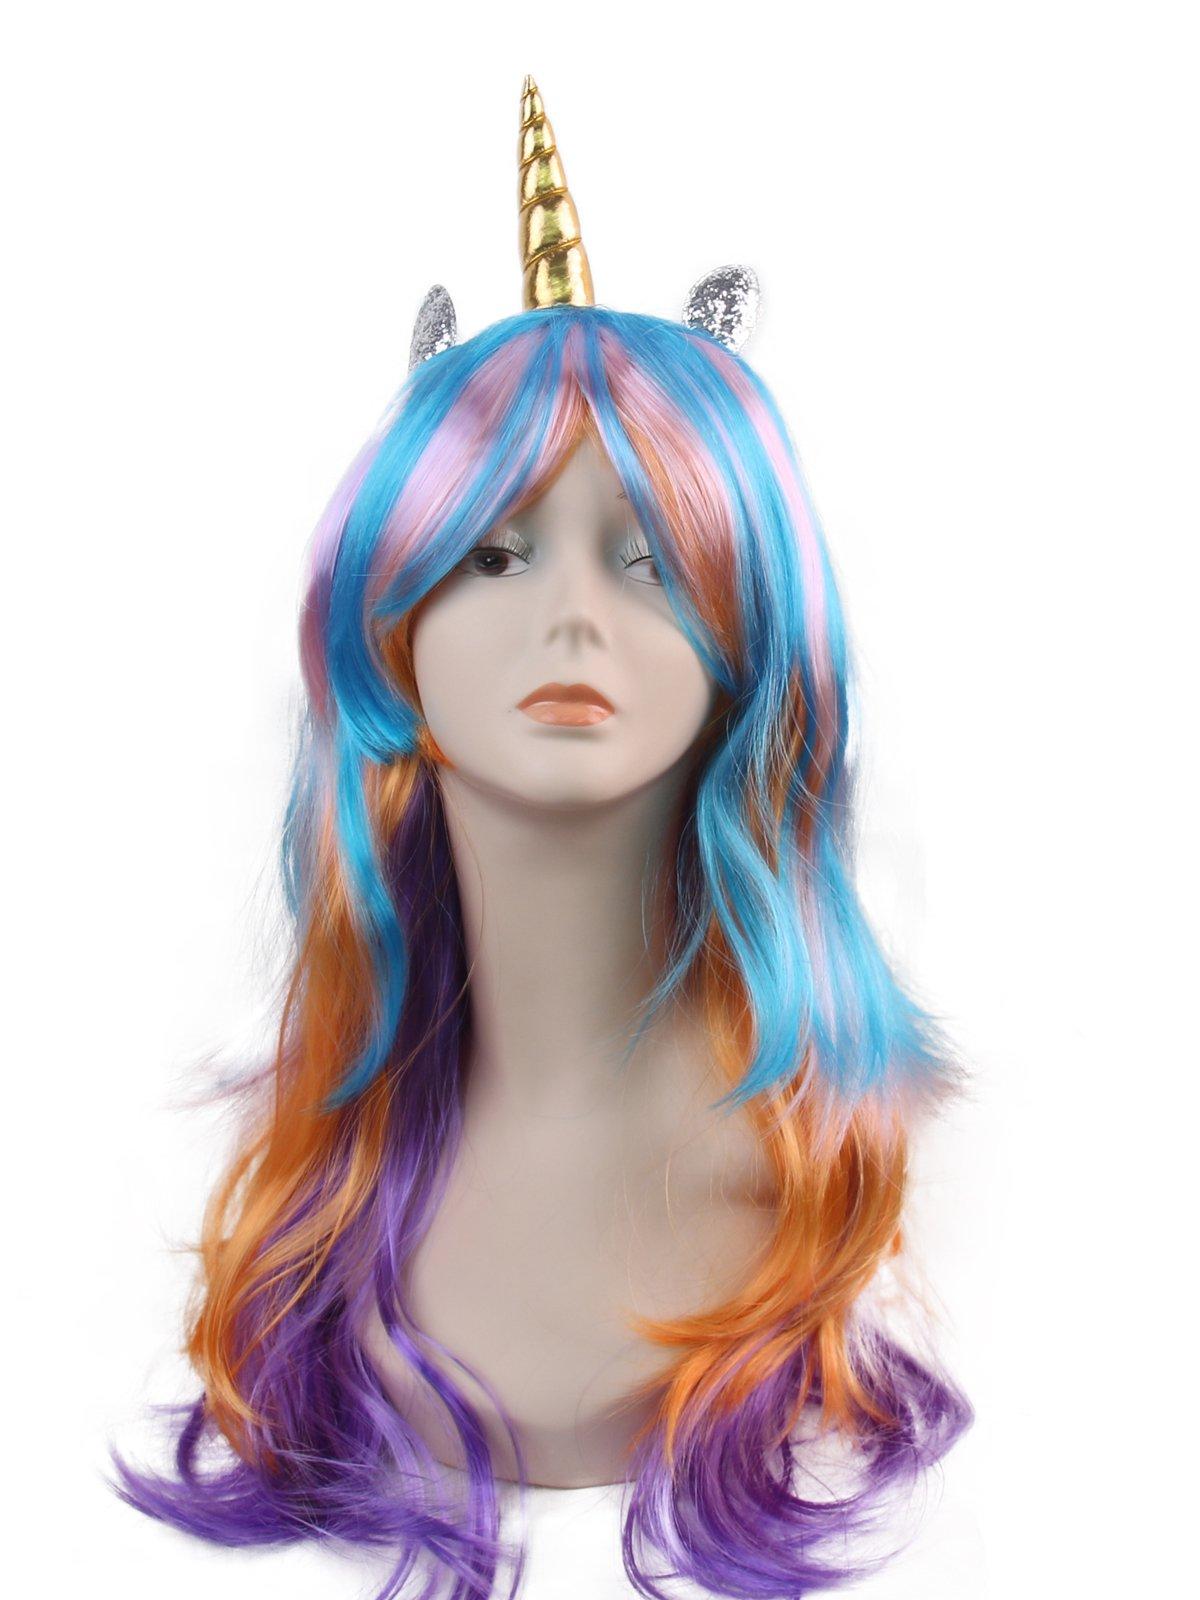 kaste Women Princess Rainbow Unicorn Wig Long Curly Hair Wigs Halloween Party Cosplay Wig Fit Women